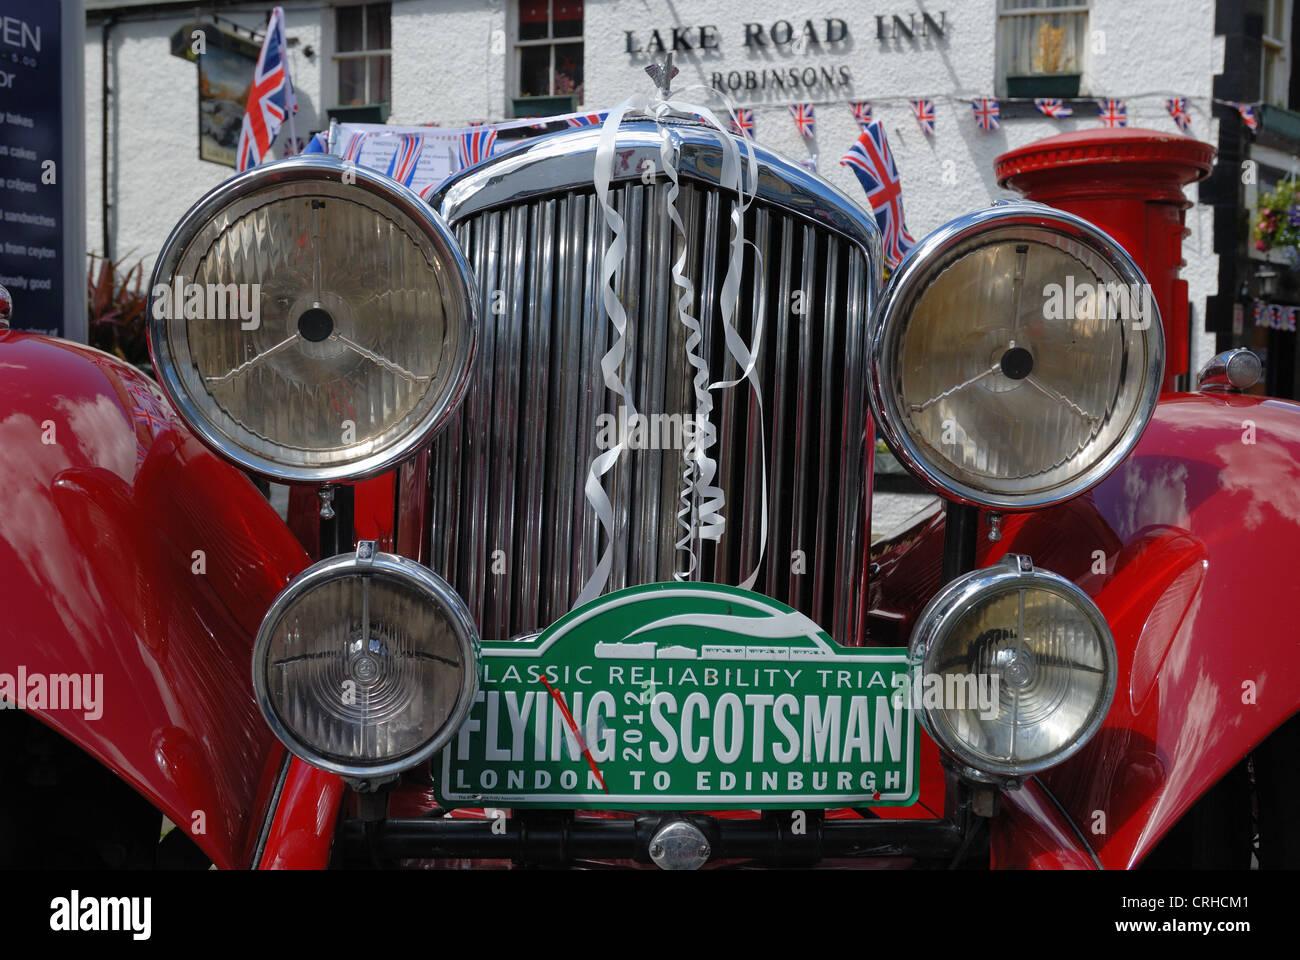 Old vintage Bentley motor car - Stock Image